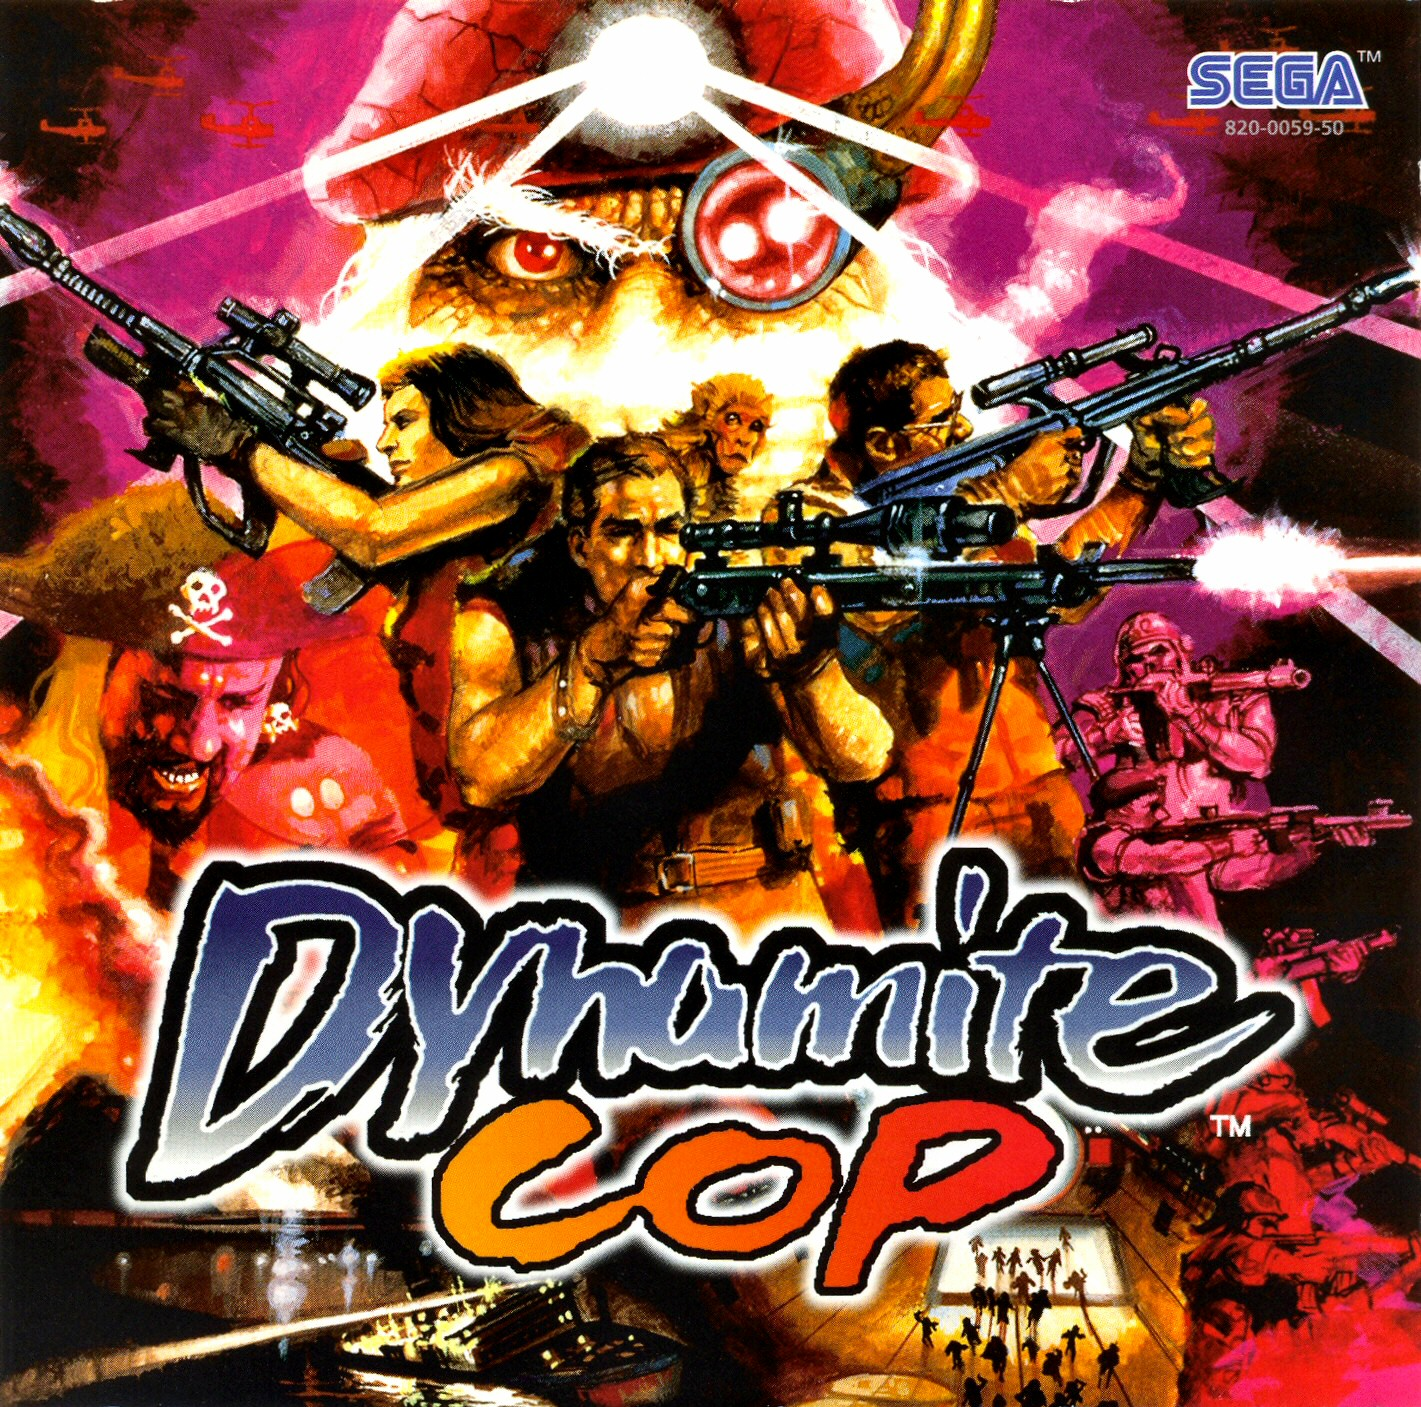 Octopus Iphone Wallpaper Download Dynamite Cop Rom